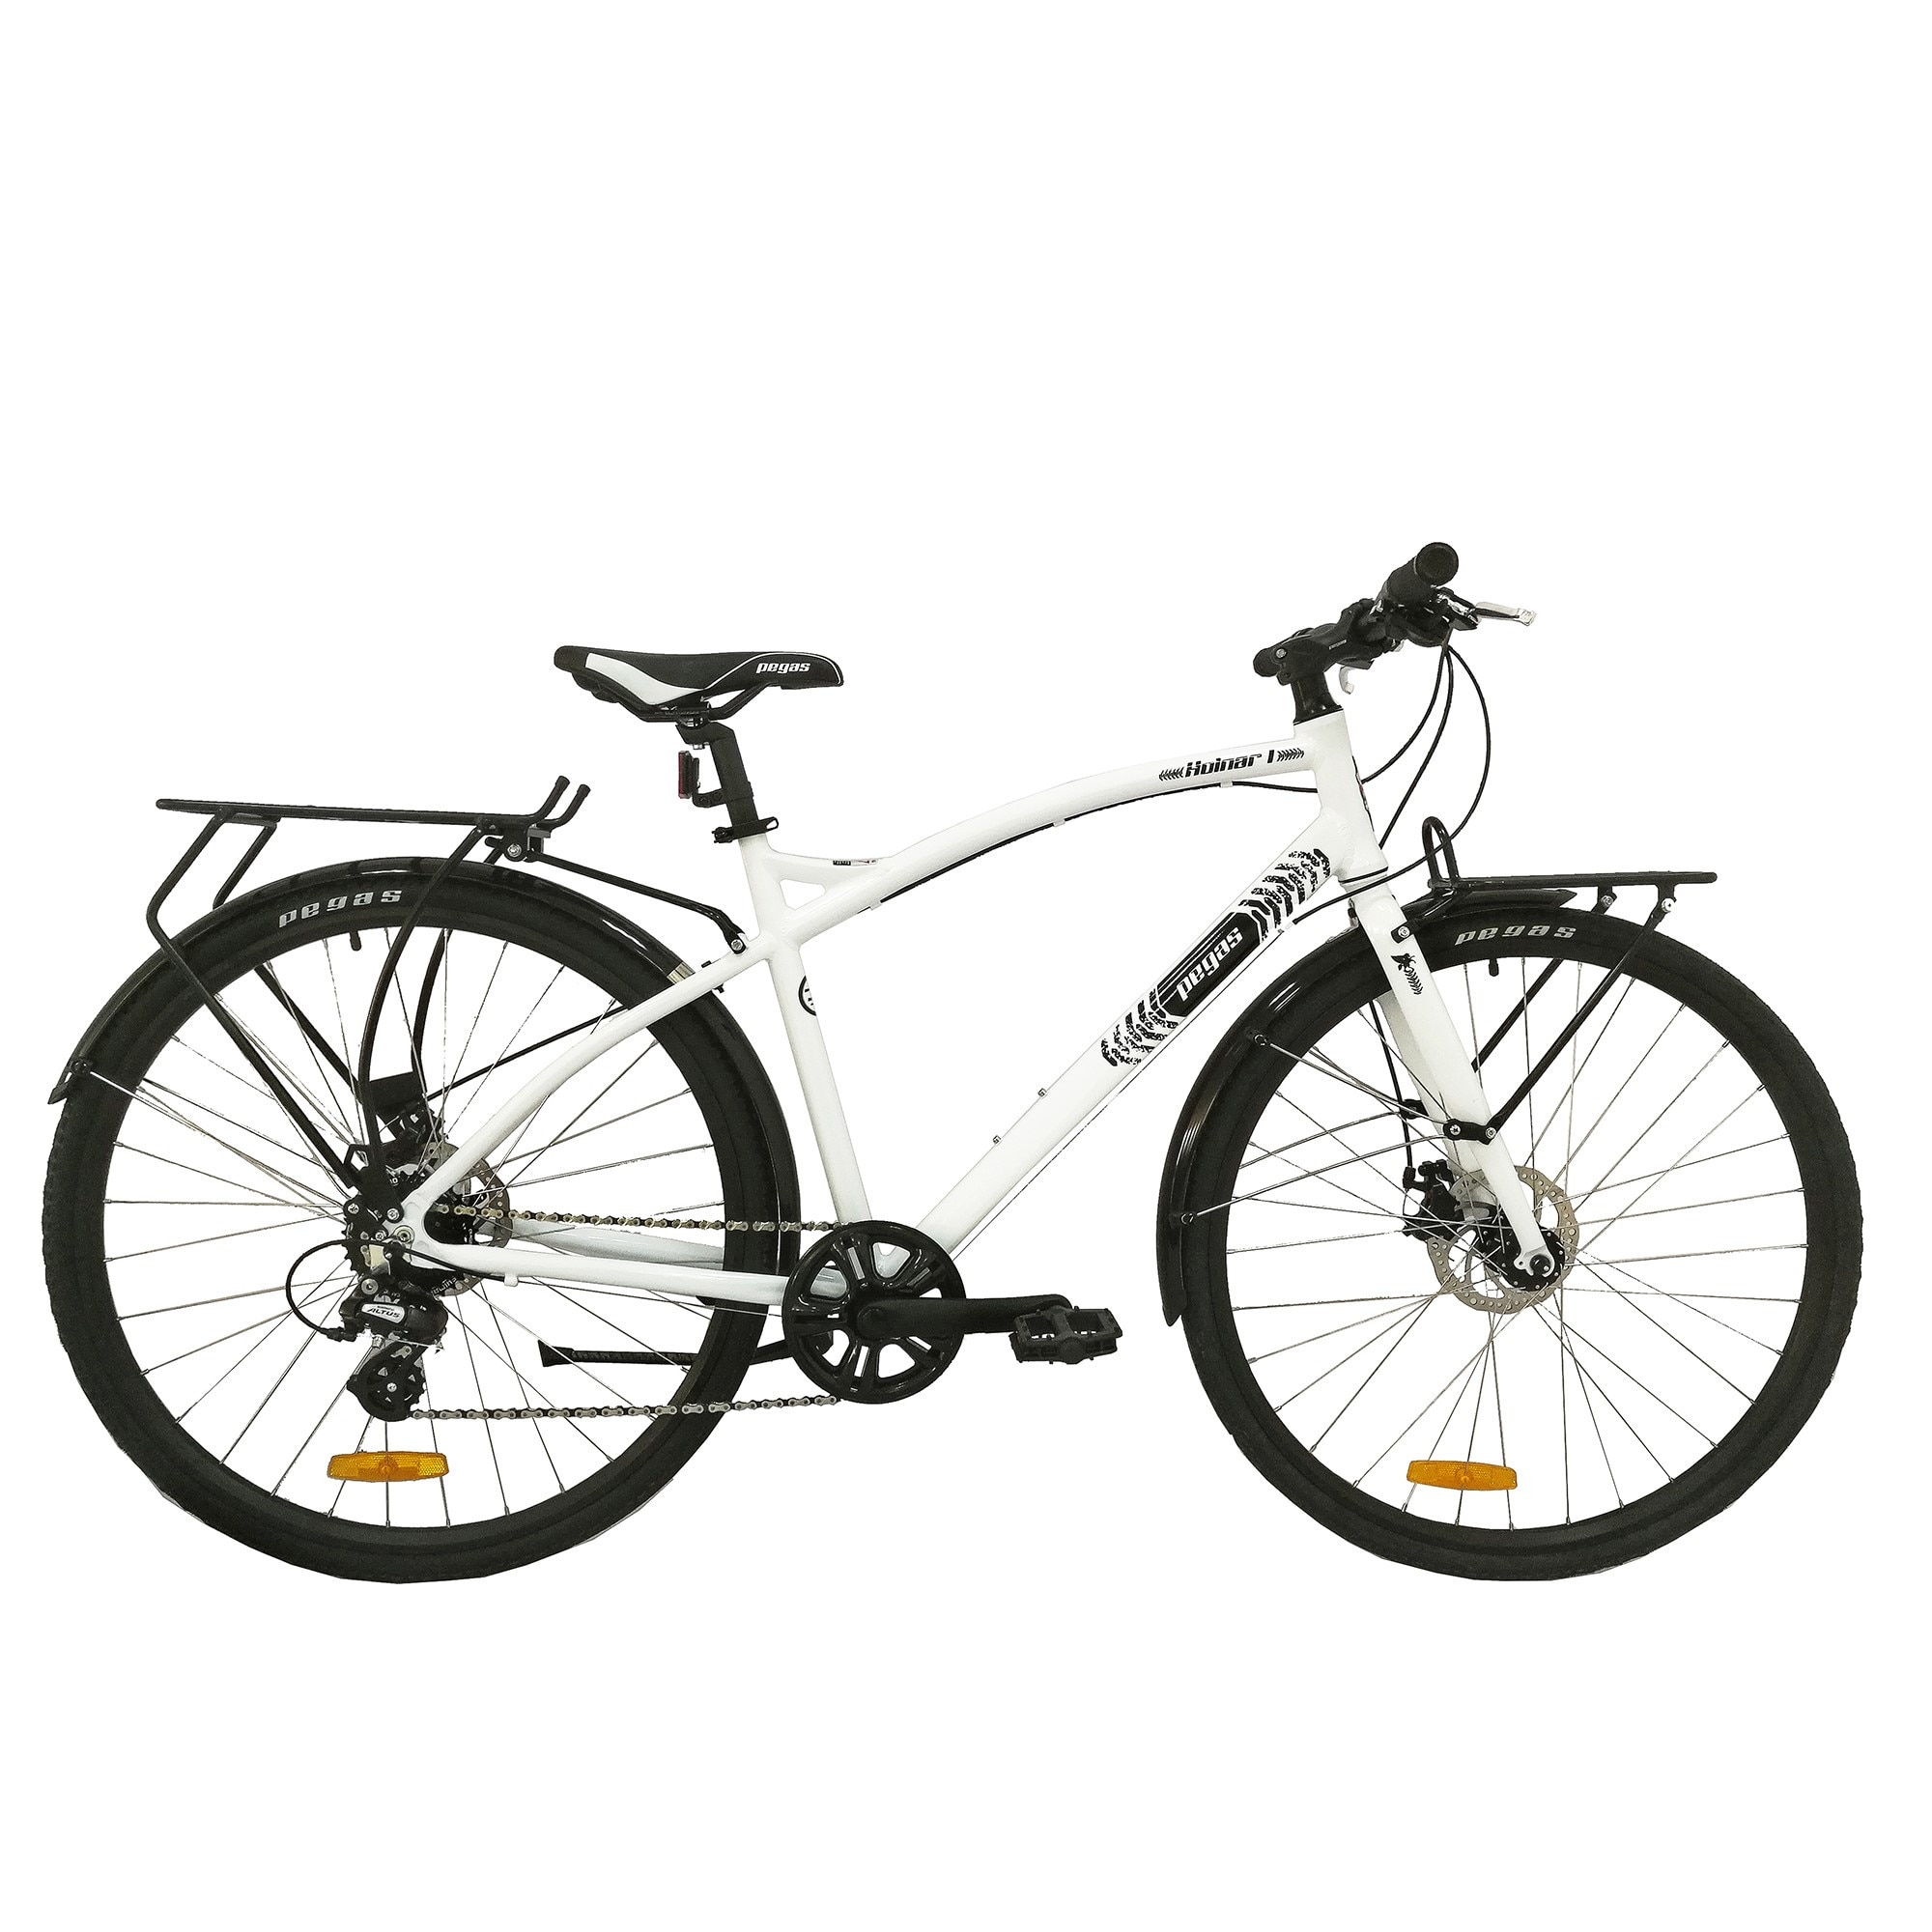 Fotografie Bicicleta Pegas Hoinar 1, 8S, Alb Perlat